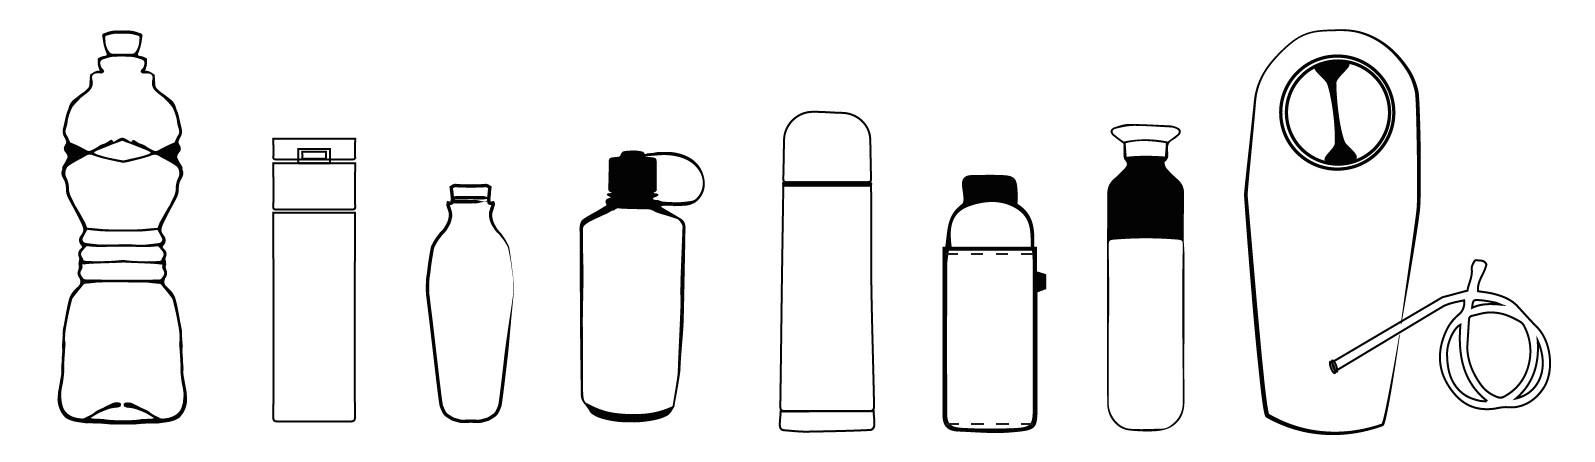 water bottles jpg